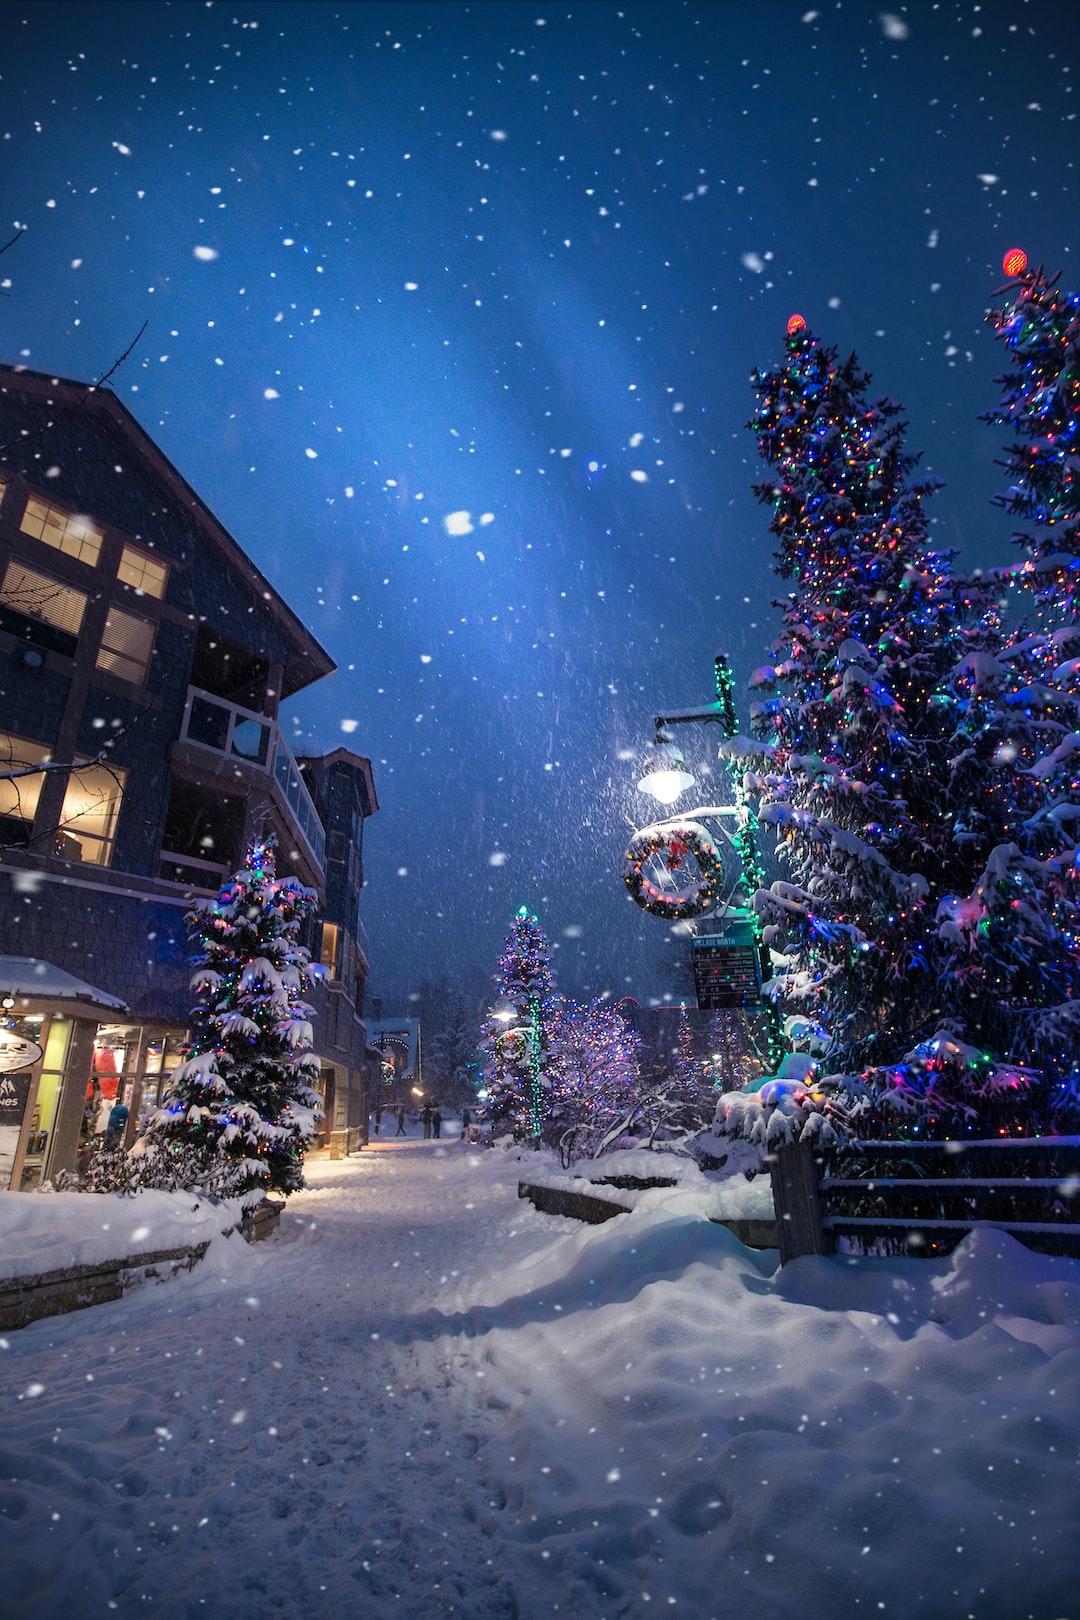 Christmas Wallpapers Free Hd Download 500 Hq Unsplash